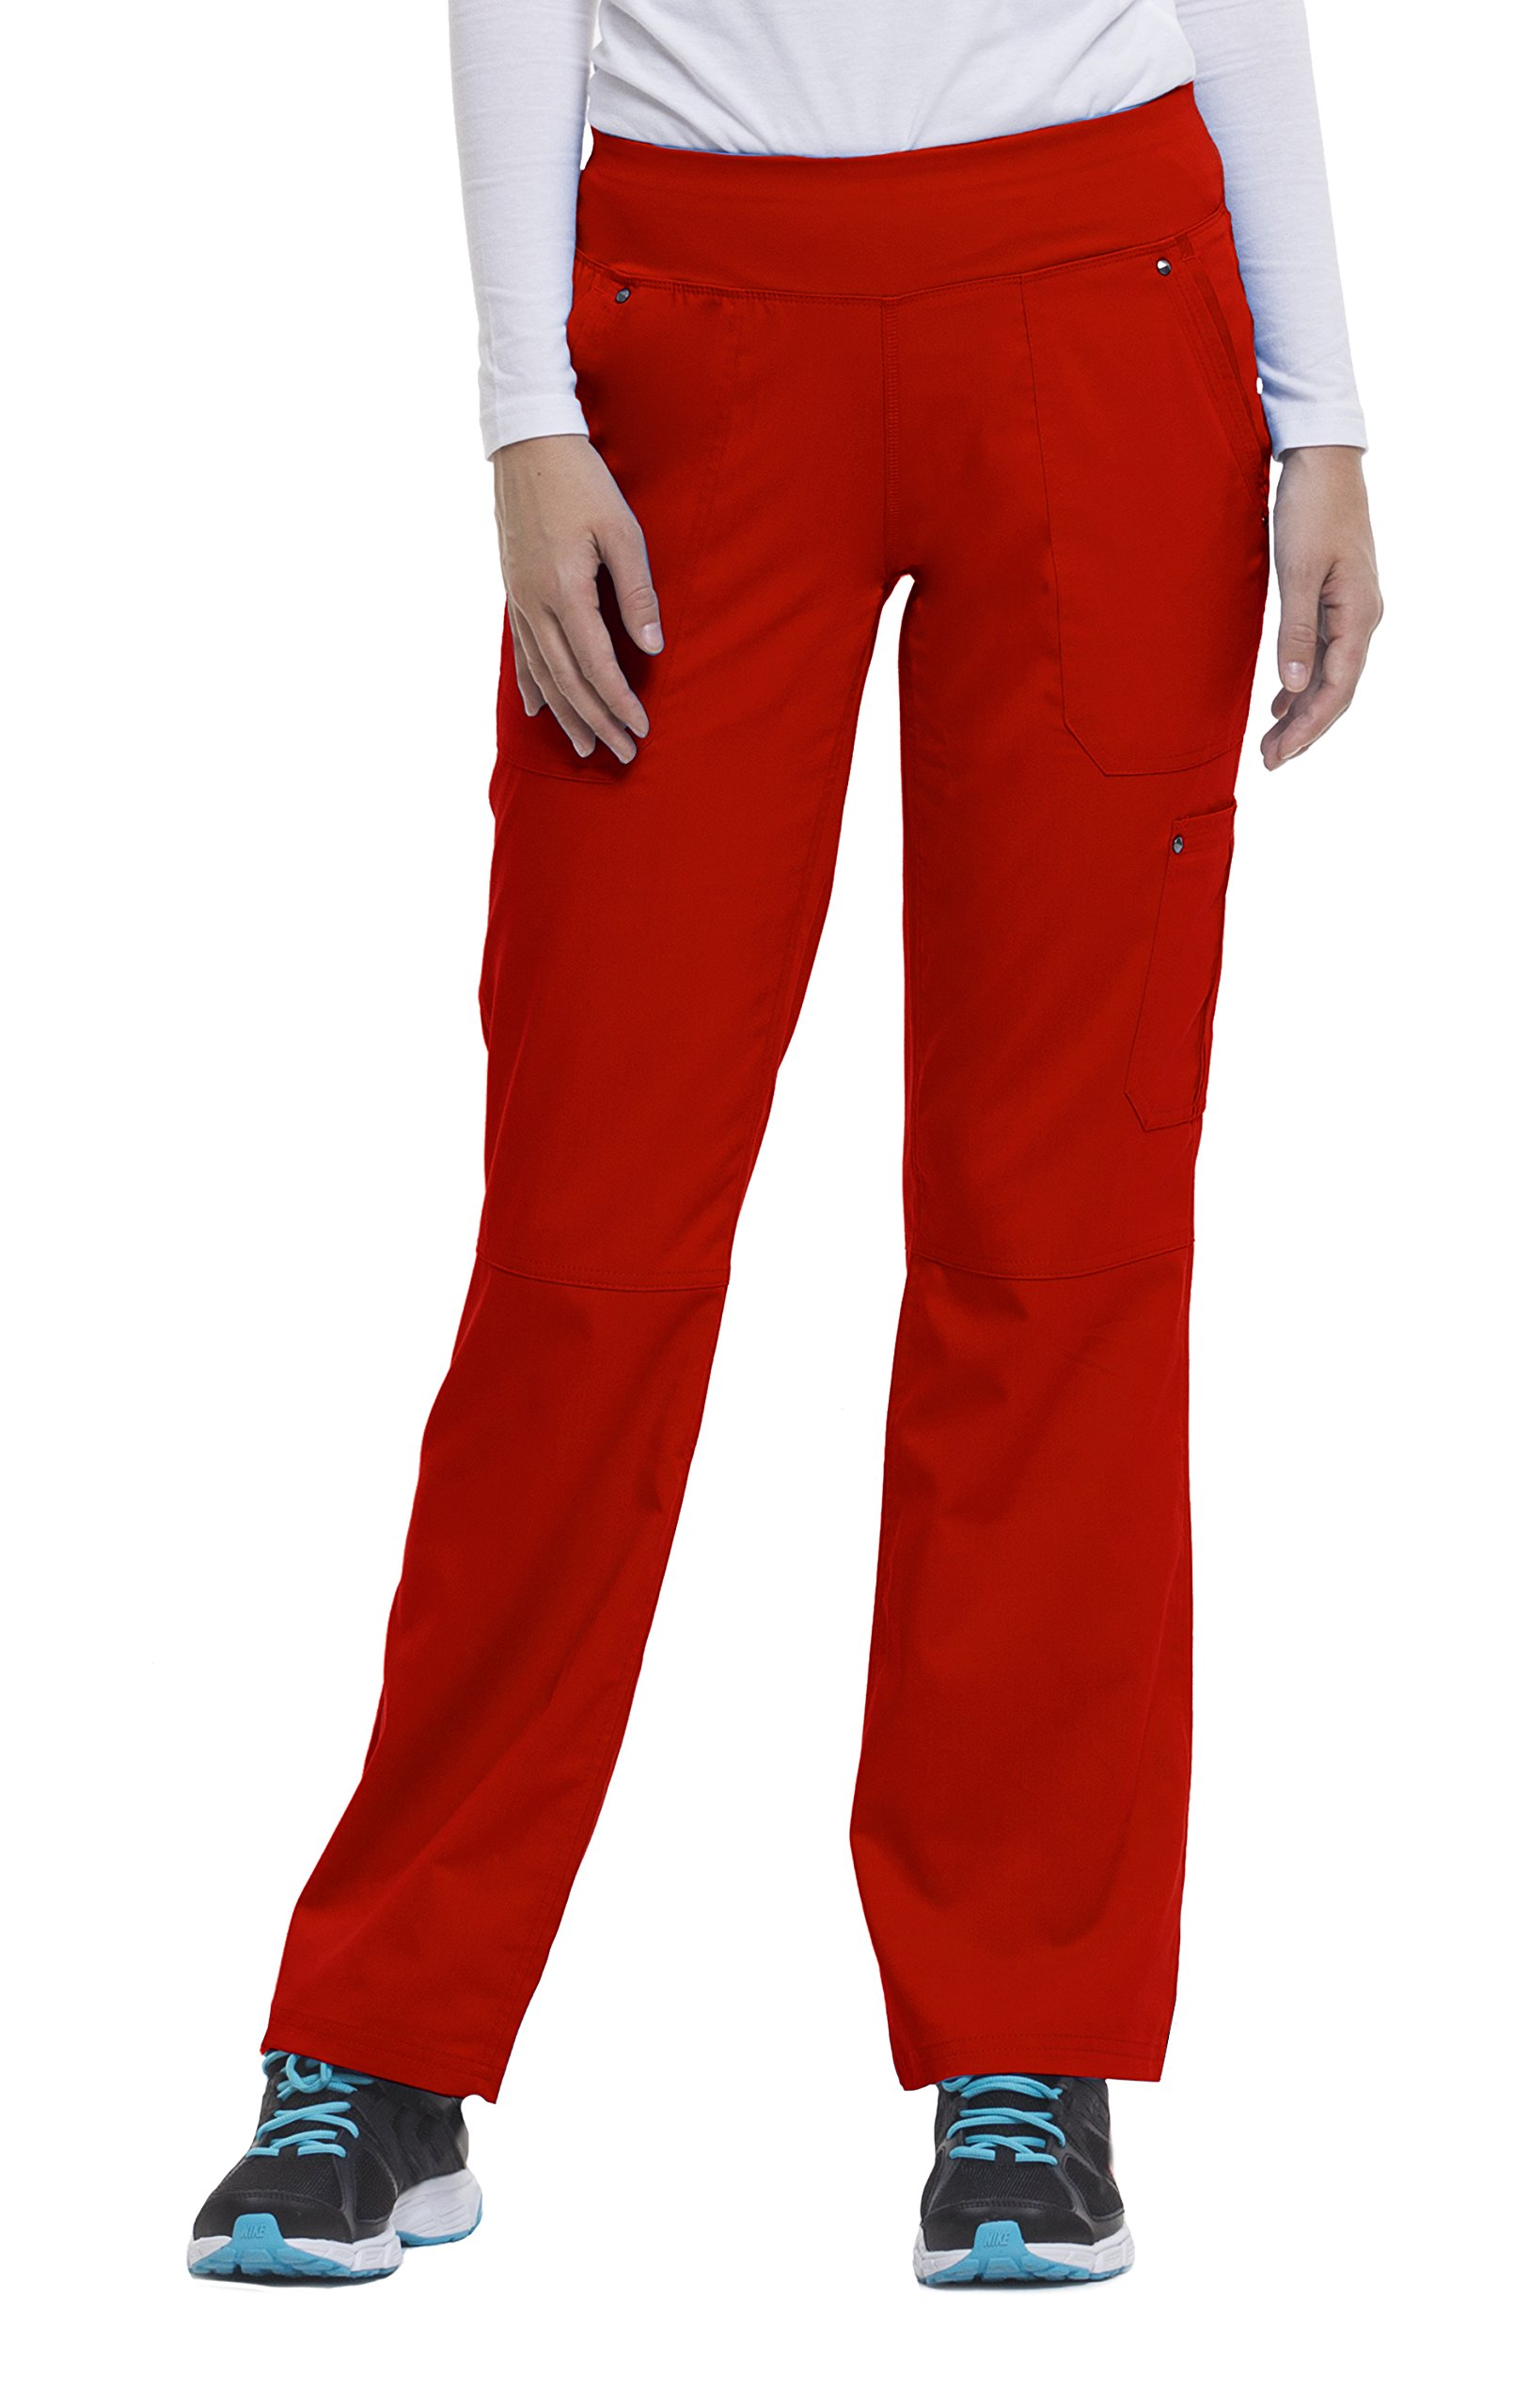 Healing Hands Purple Label Yoga Women's Tori 9133 5 Pocket Knit Waist Pant Scrubs- Red- Large Petite